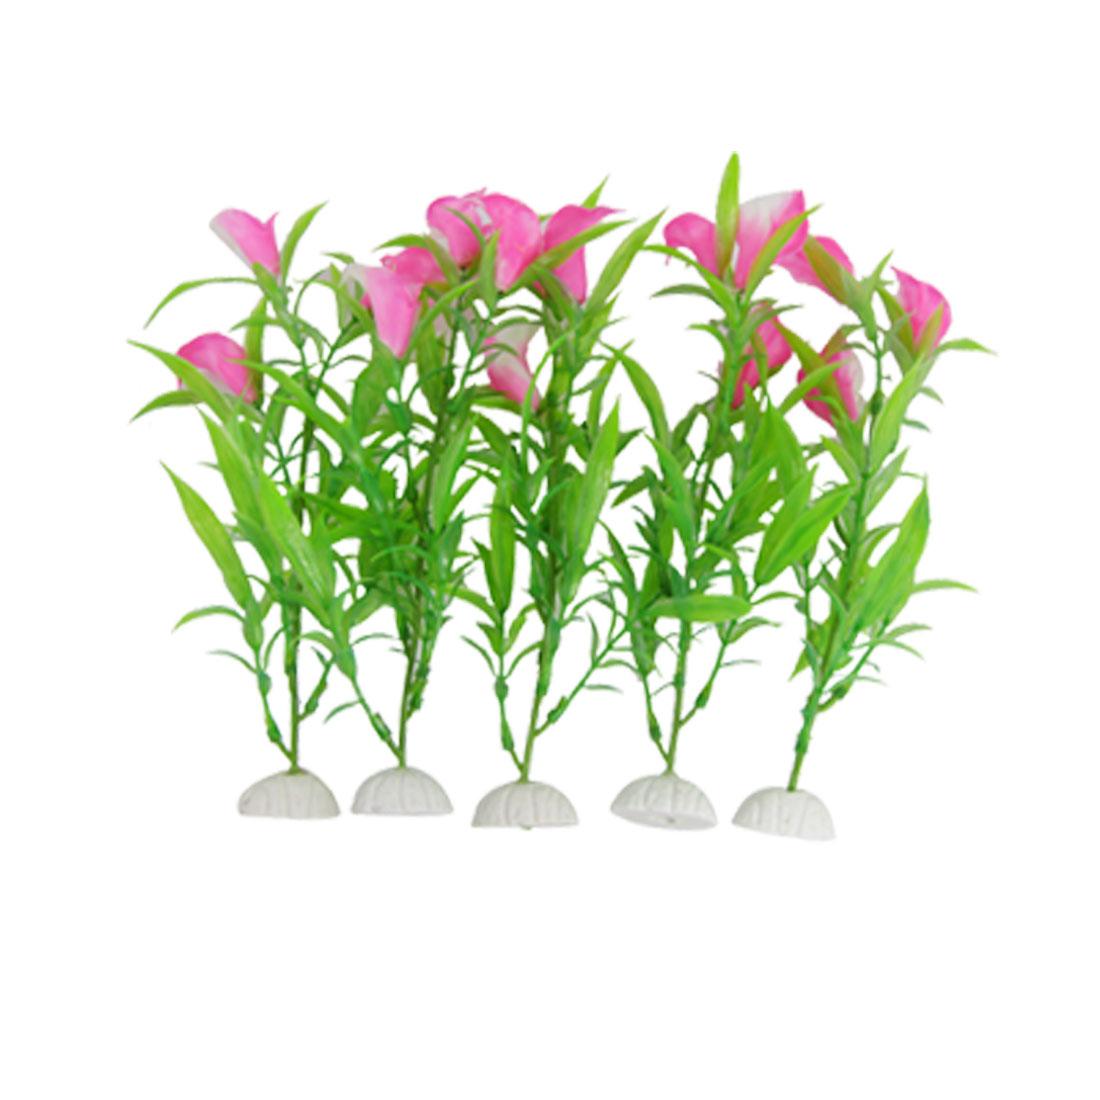 Rose Pink Plastic Calla Lily Decoration for Aquarium Fish Tank 5 Pcs